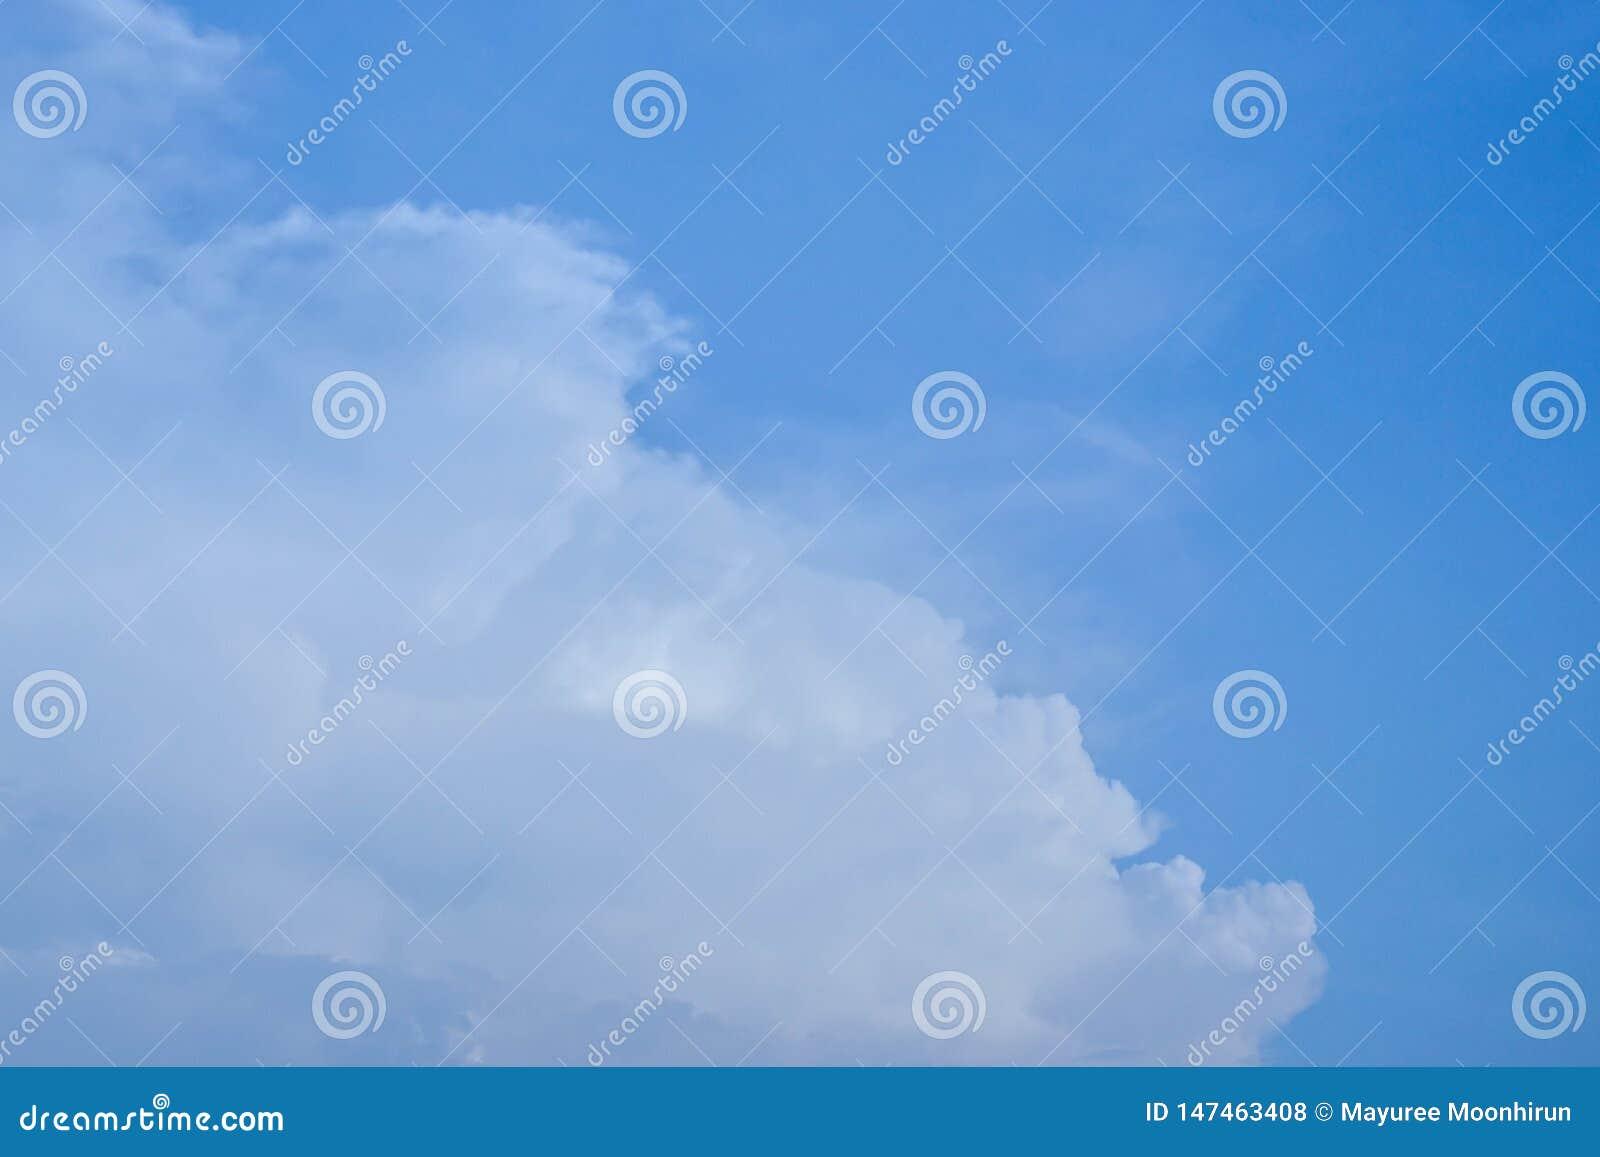 Nuvole bianche lanuginose su cielo blu profondo di estate